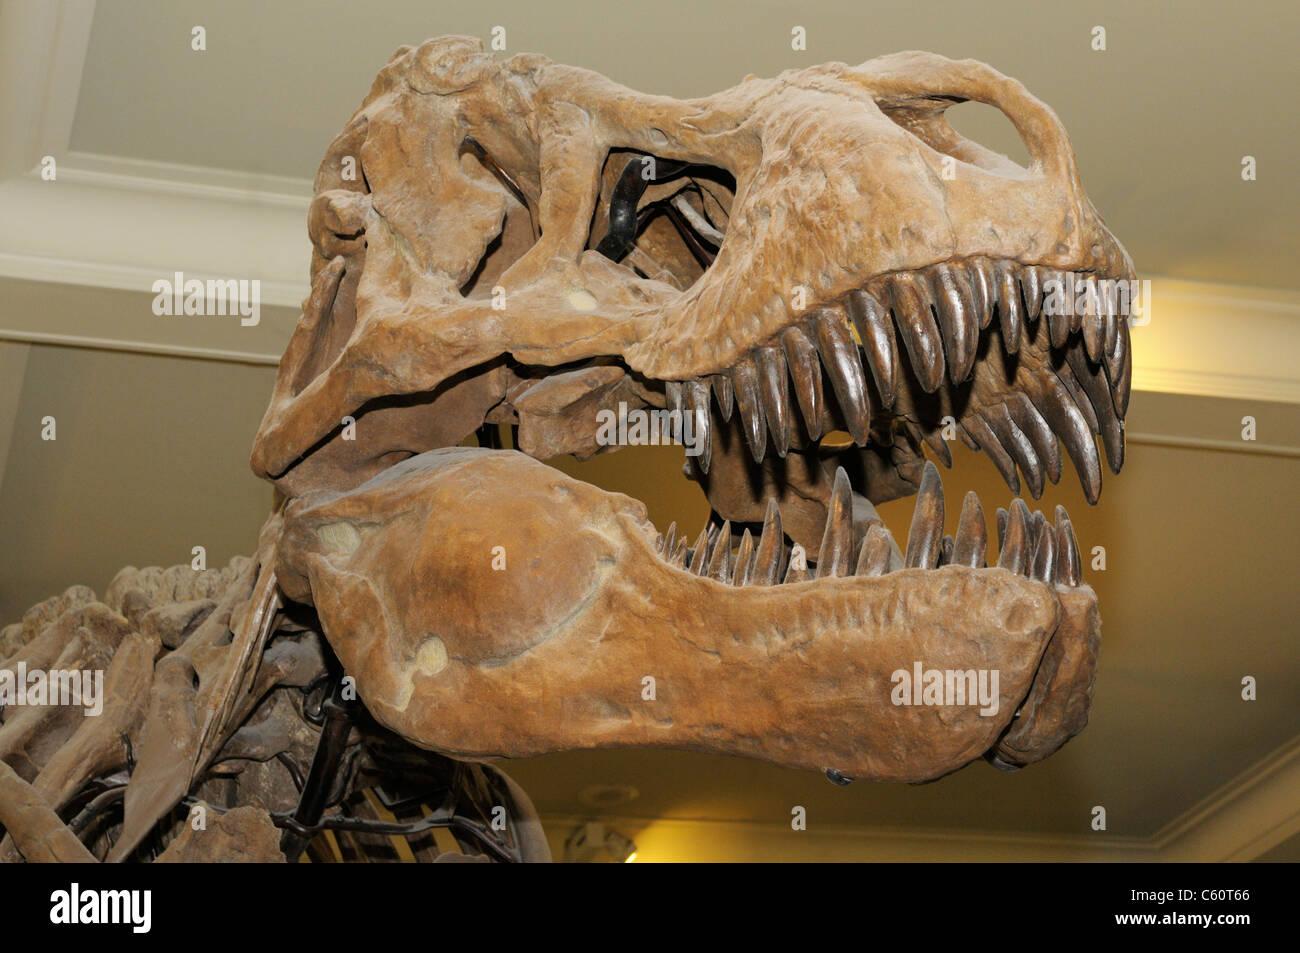 Tyrannosaurus rex skeleton from the late Cretaceous - Stock Image